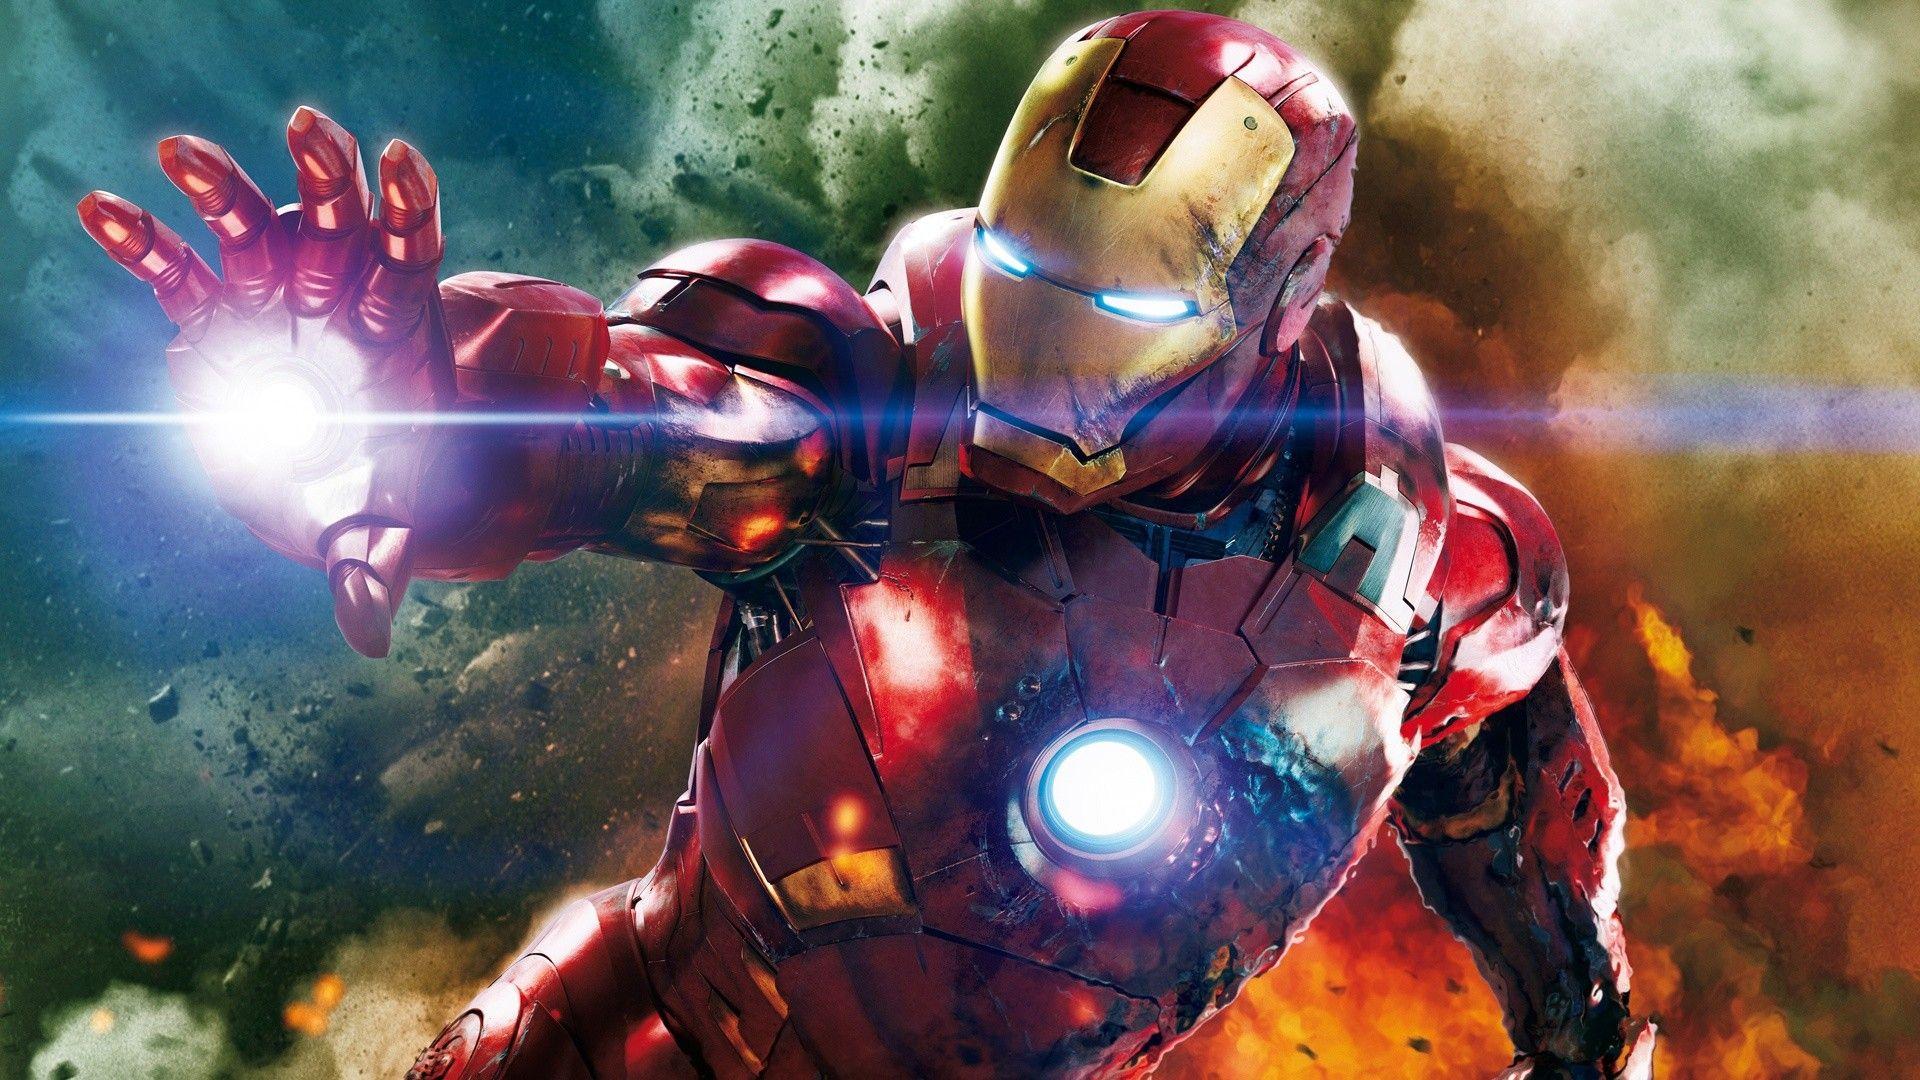 Hd wallpaper cool - Cool Wallpapers Iron Man 3 Hd Wallpaper